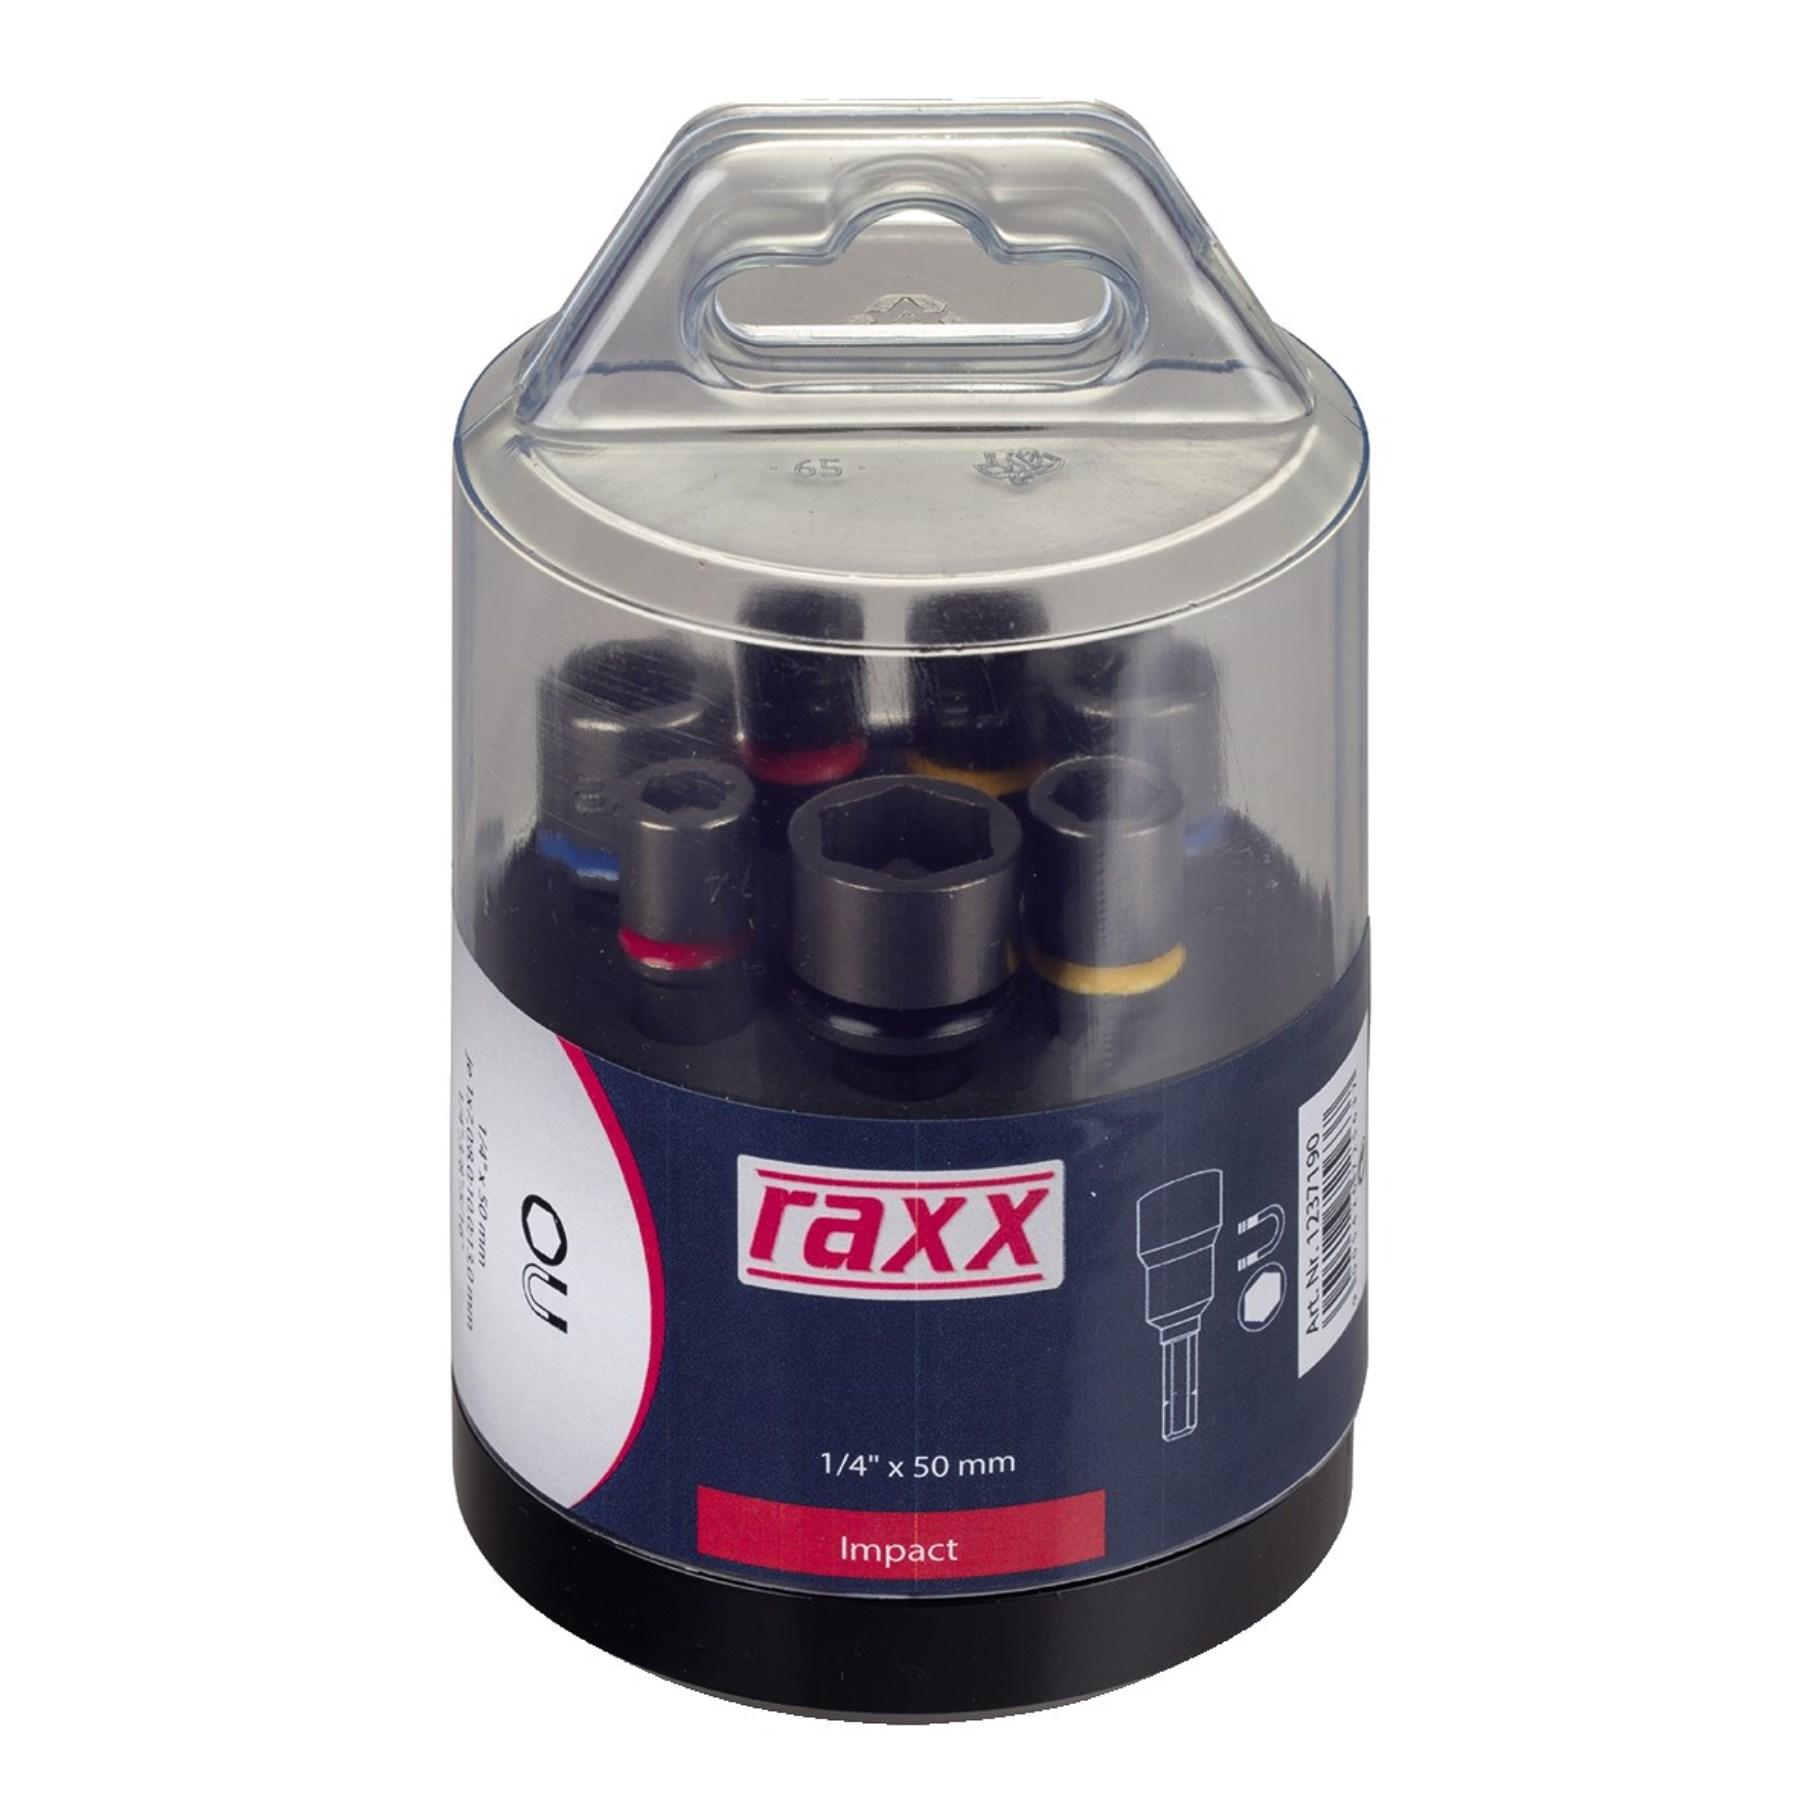 "RAXX 1237190 sada nástrčných hlavic 7díl. IMPACT 1/4"" E 6,30 [ 9005426725637 ]"